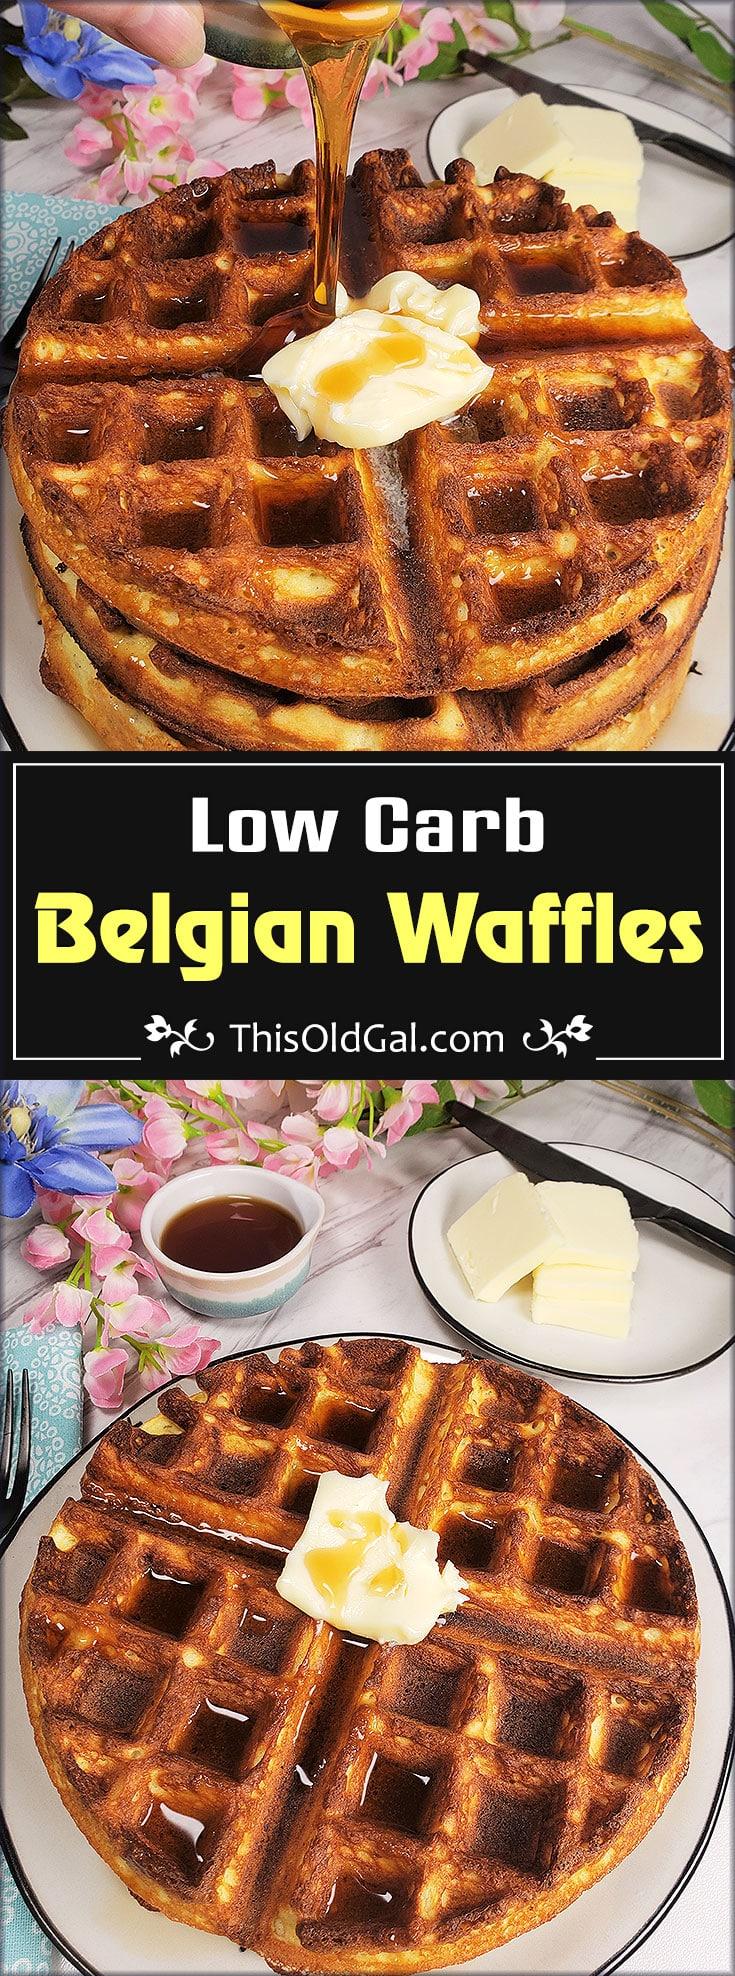 Keto Low Carb Coconut Flour Belgian Waffles